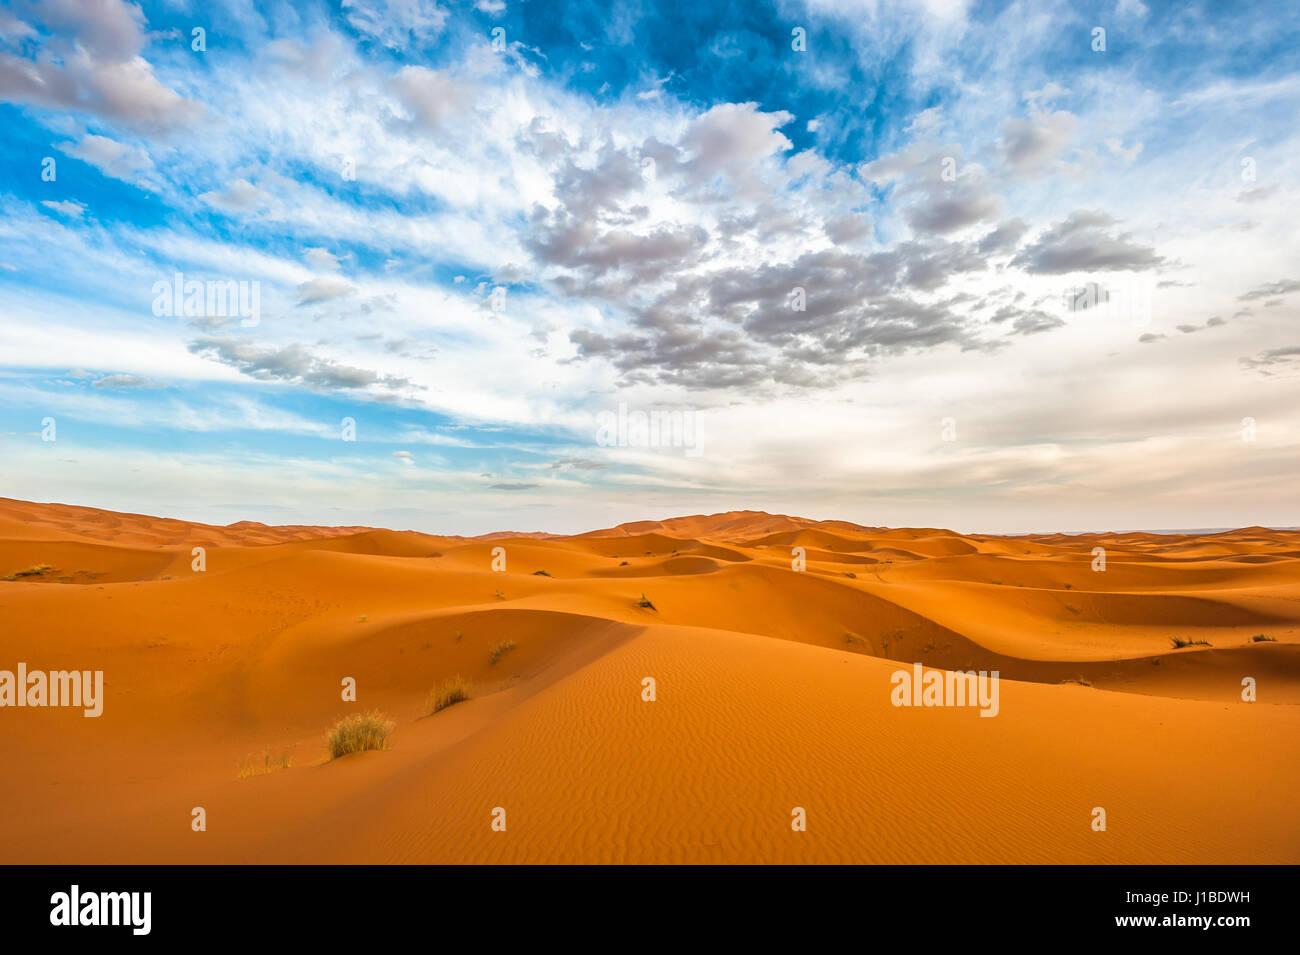 Sand dunes of Erg Chebbi, Morocco - Stock Image